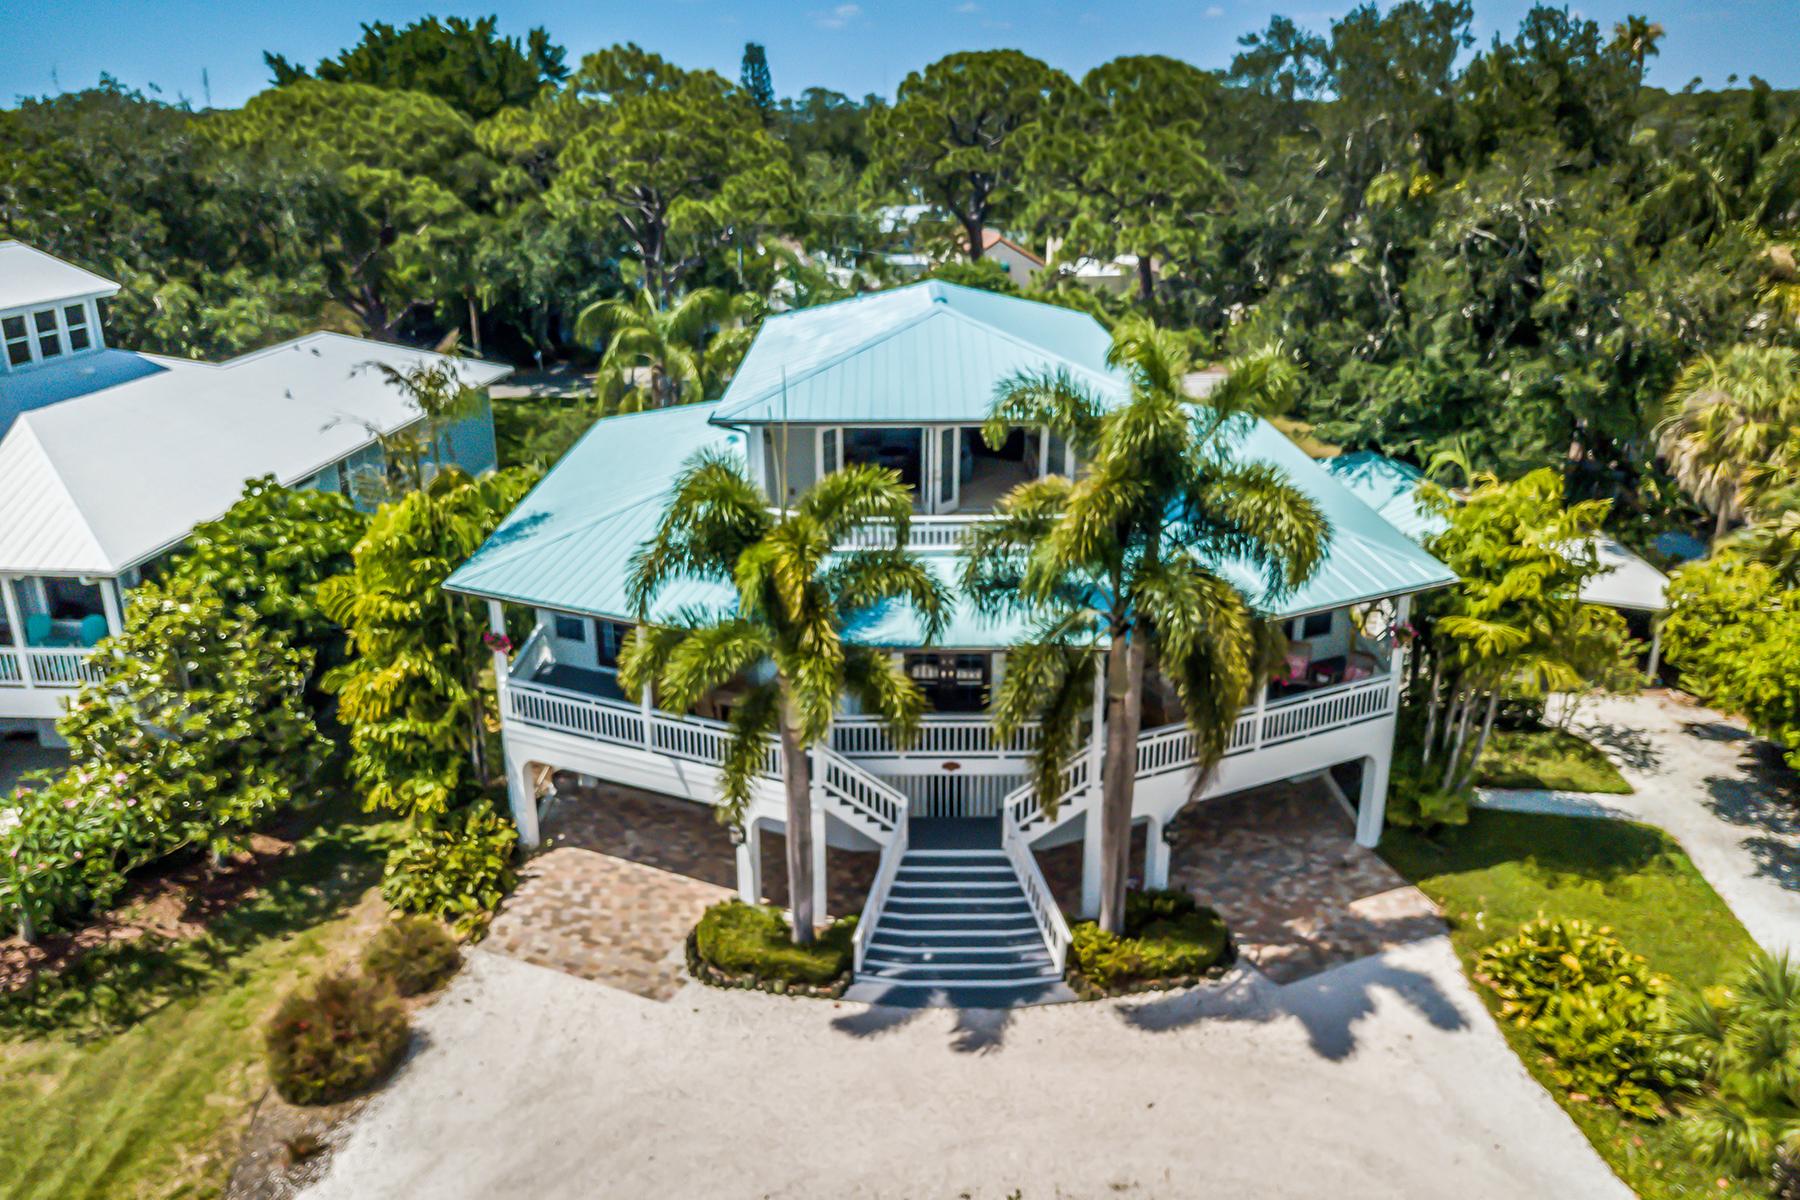 Single Family Homes for Sale at NOKOMIS 200 Sunrise Dr, Nokomis, Florida 34275 United States